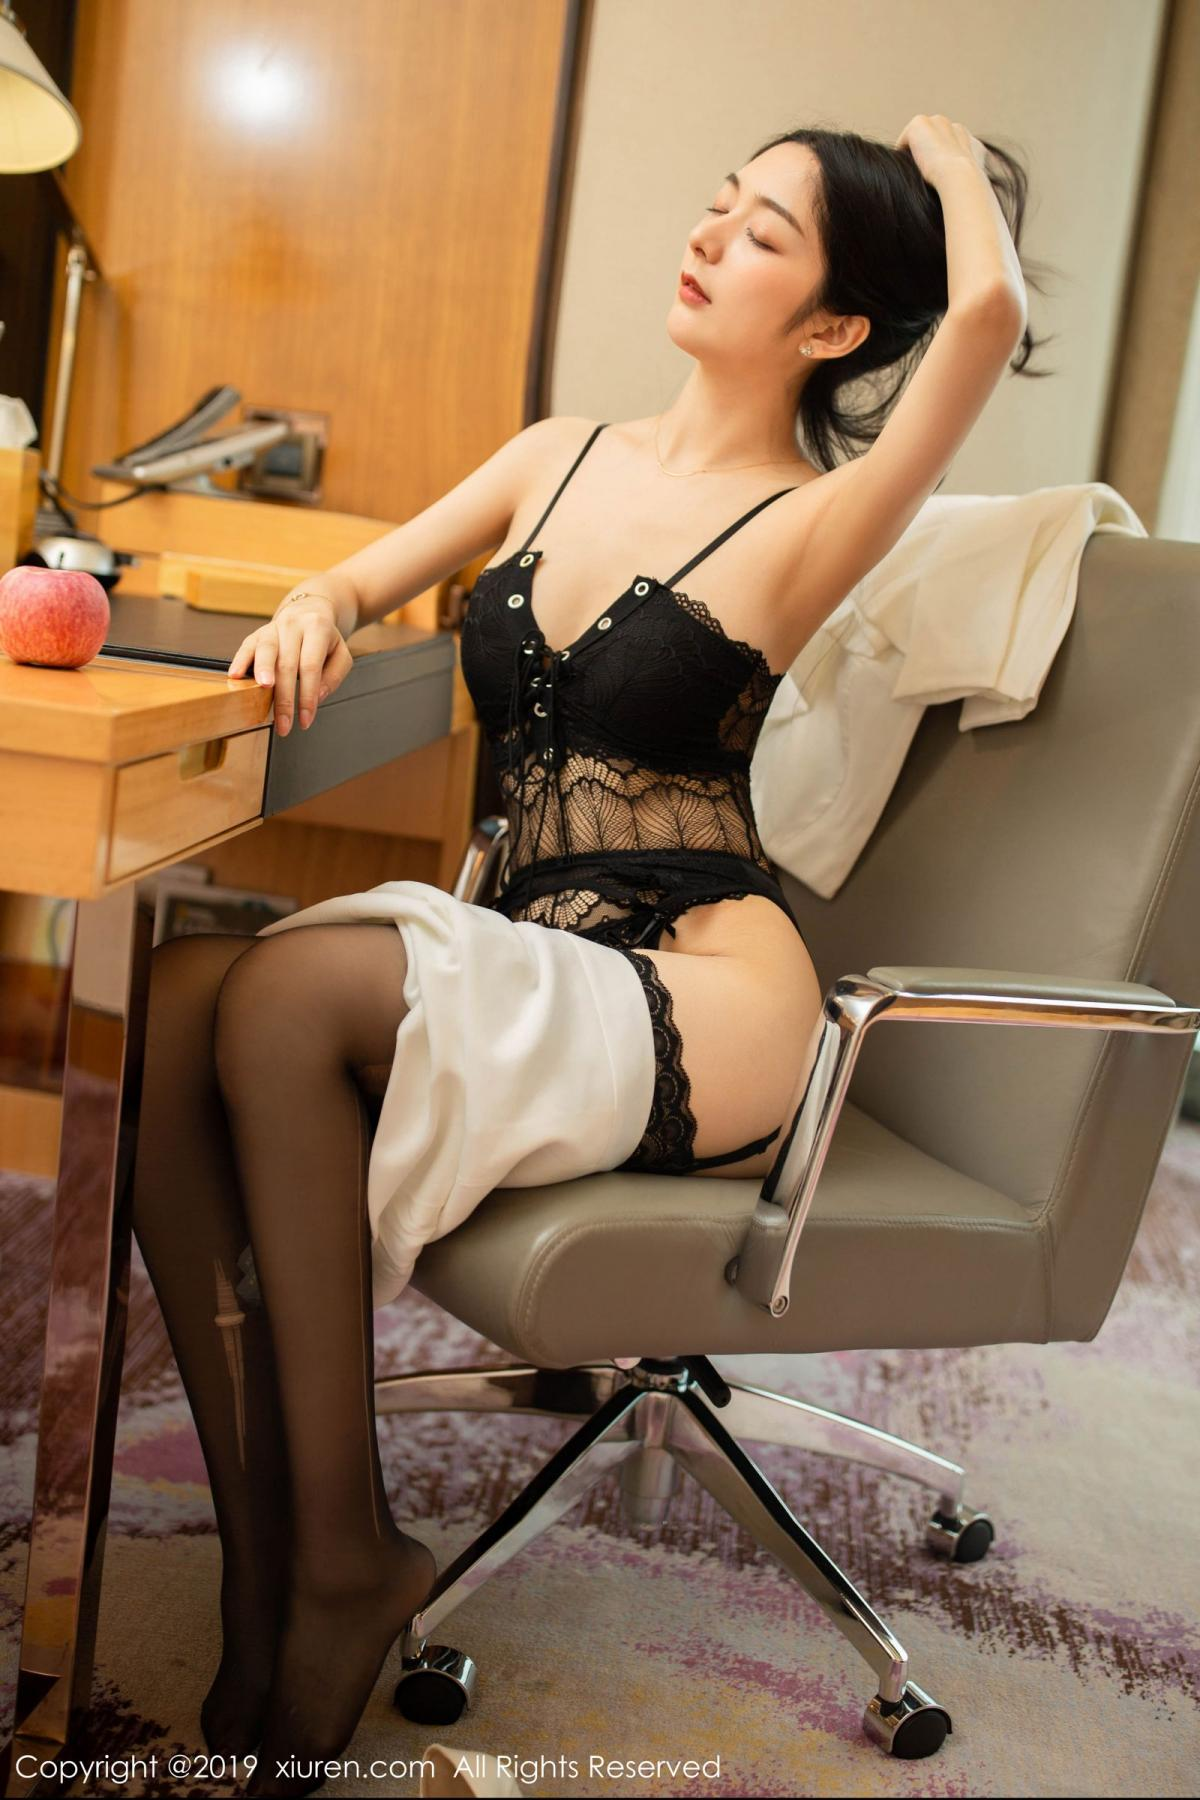 [XiuRen] Vol.1821 Come to my room and sit after you get off work 46P, Black Silk, Di Yi, Xiuren